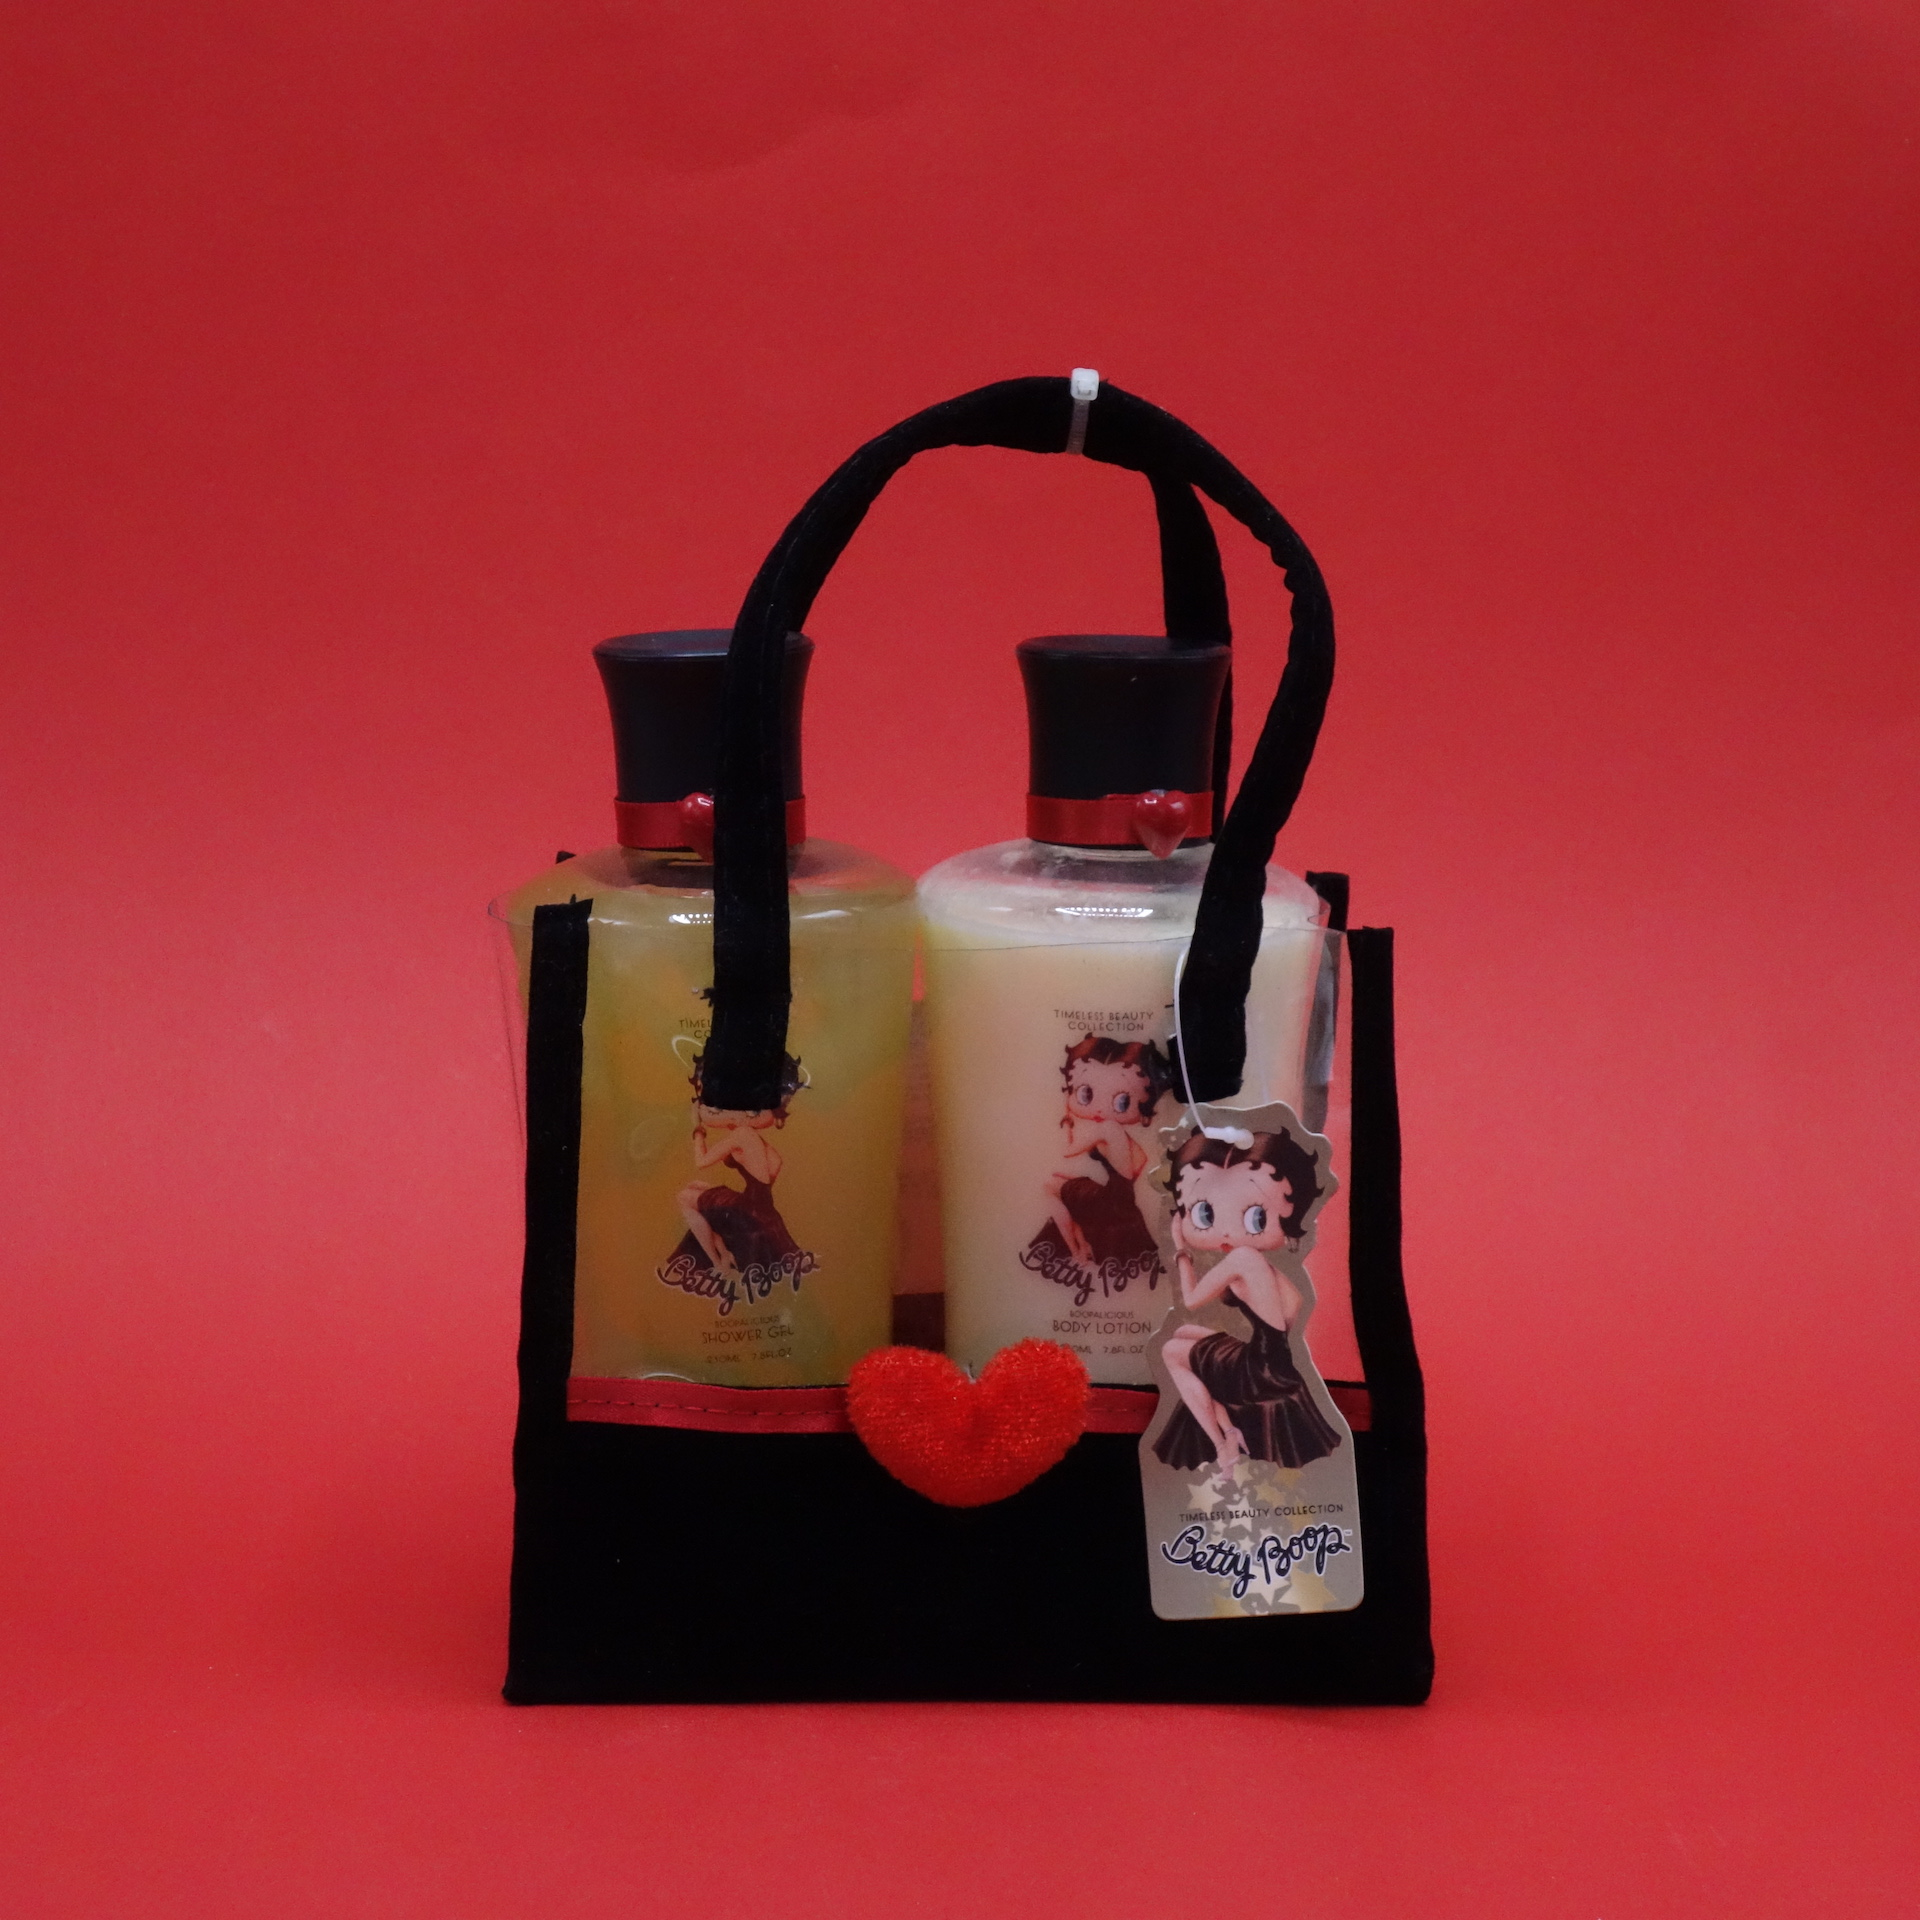 Betty Boop kleines Geschenkset Duschgel Body Lotion